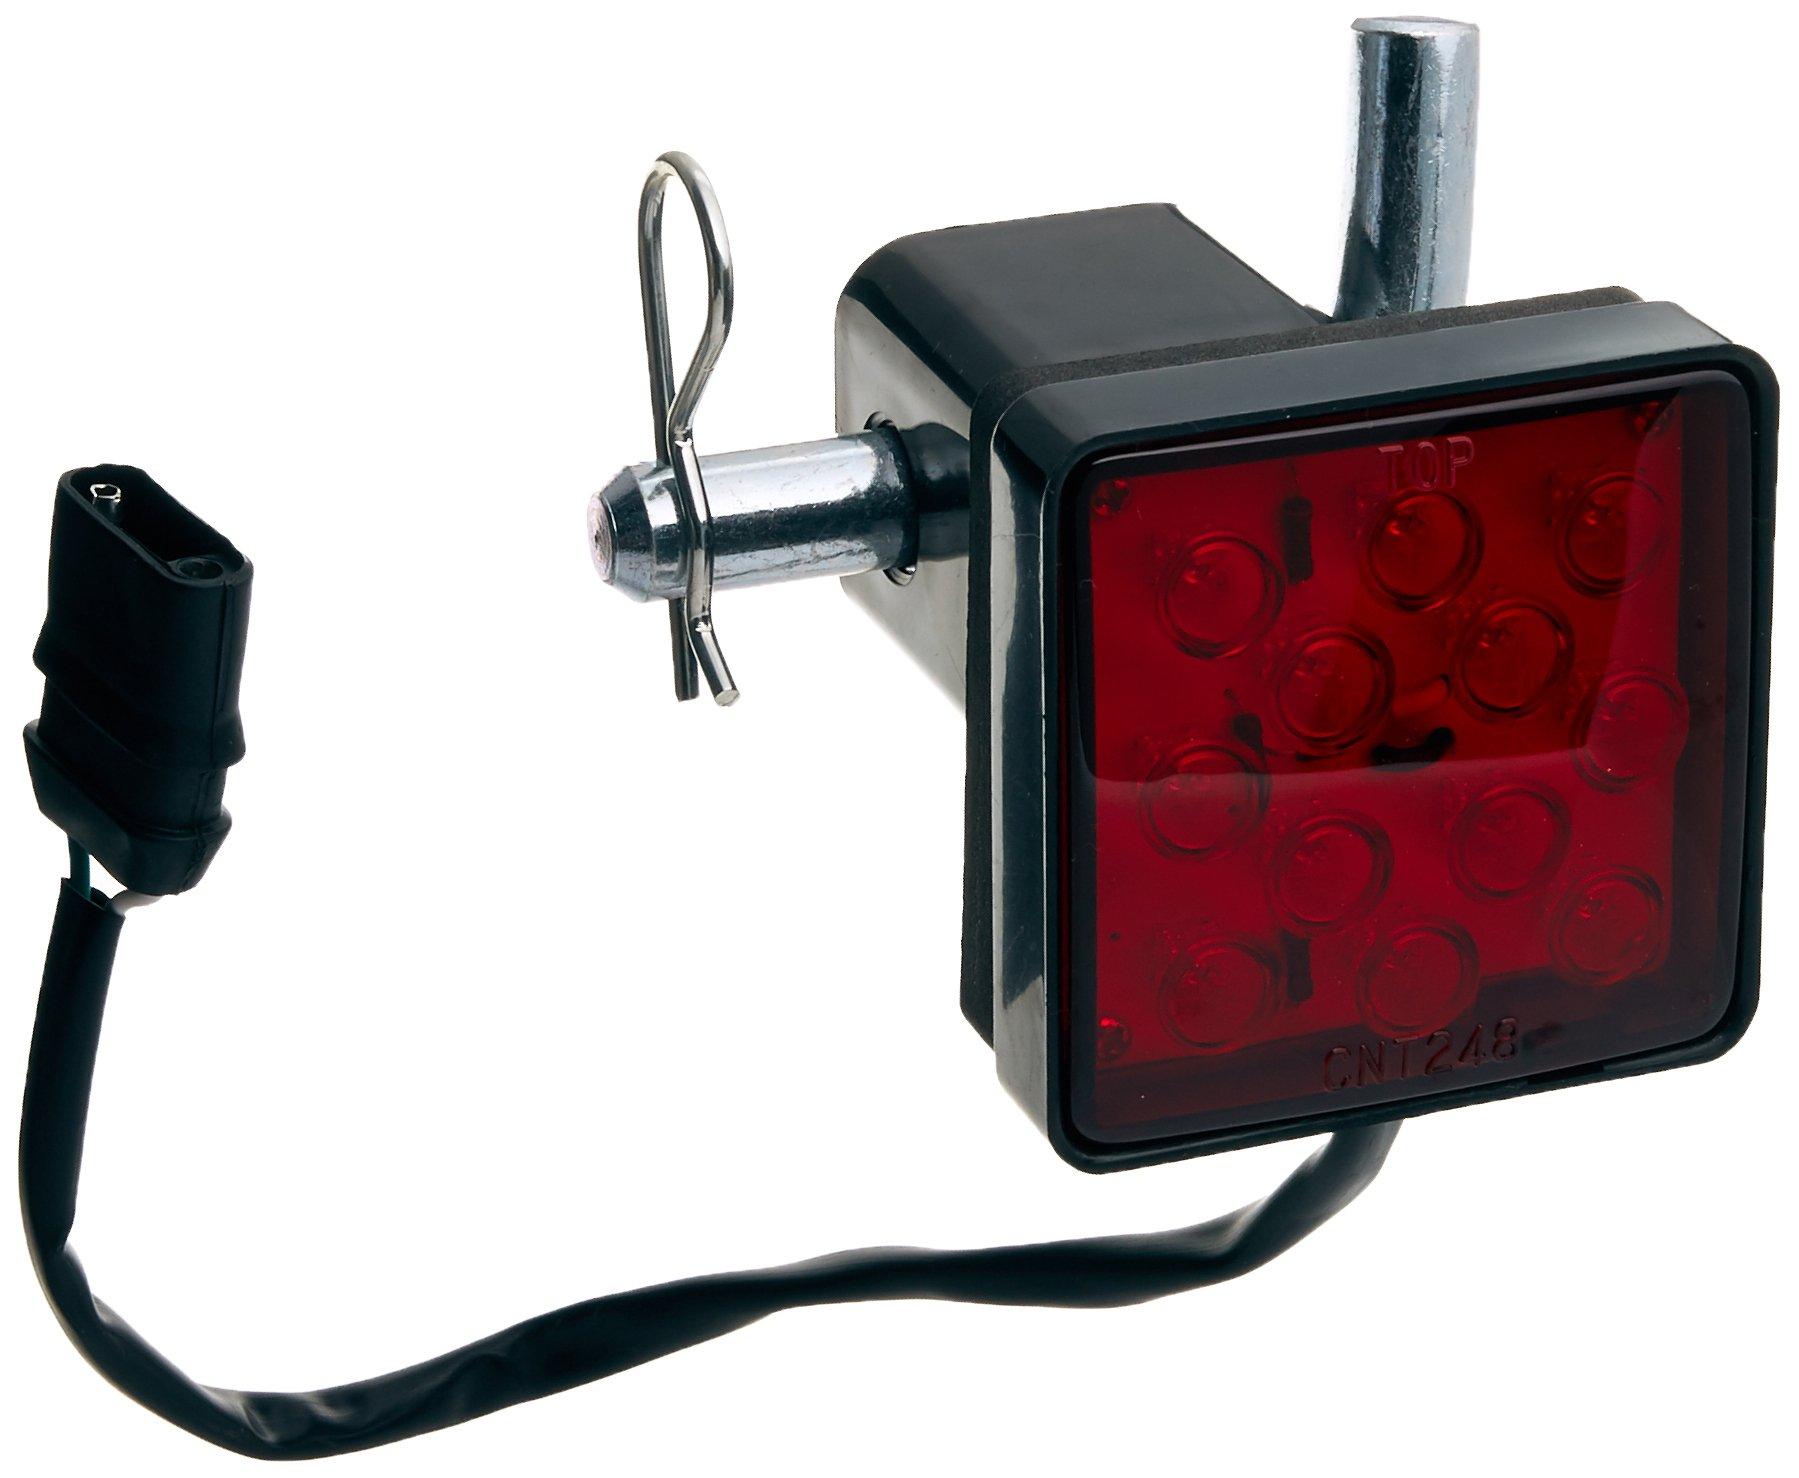 MaxxHaul 70429 Trailer Hitch Cover with 12 LED's Brake Light by MaxxHaul